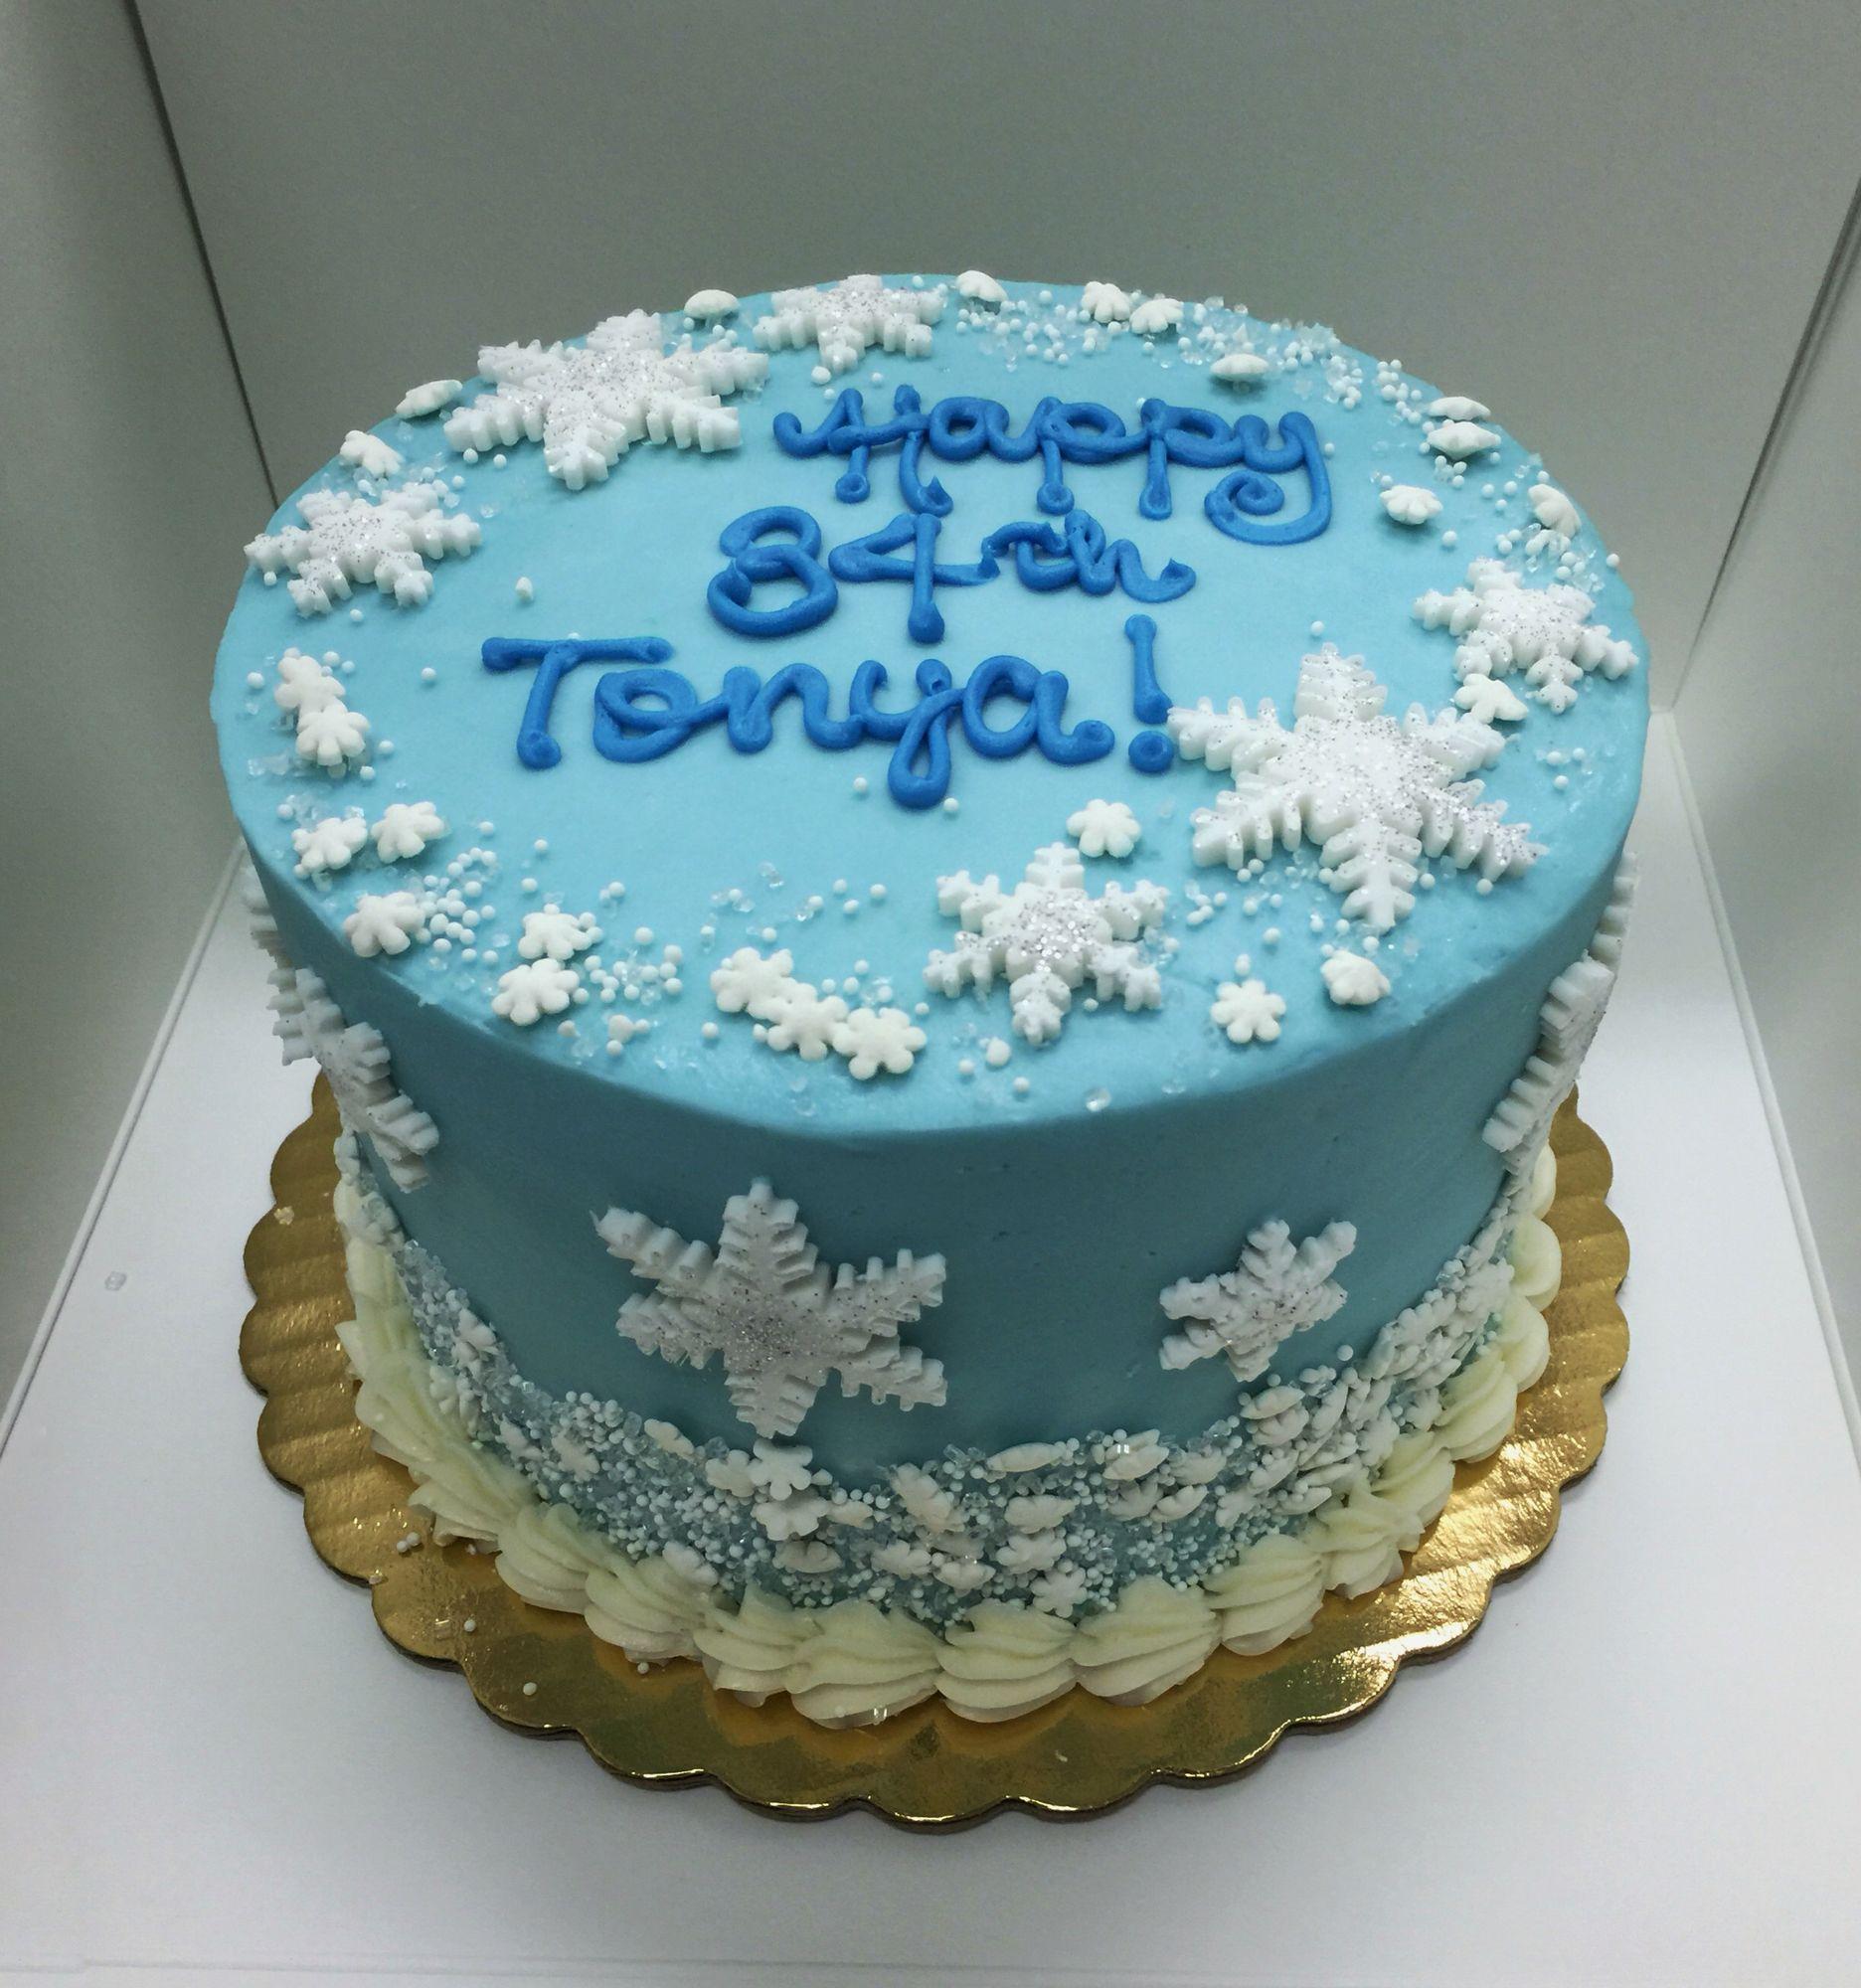 Winter Themed Birthday Cake Creative Cakes Pinterest Creative